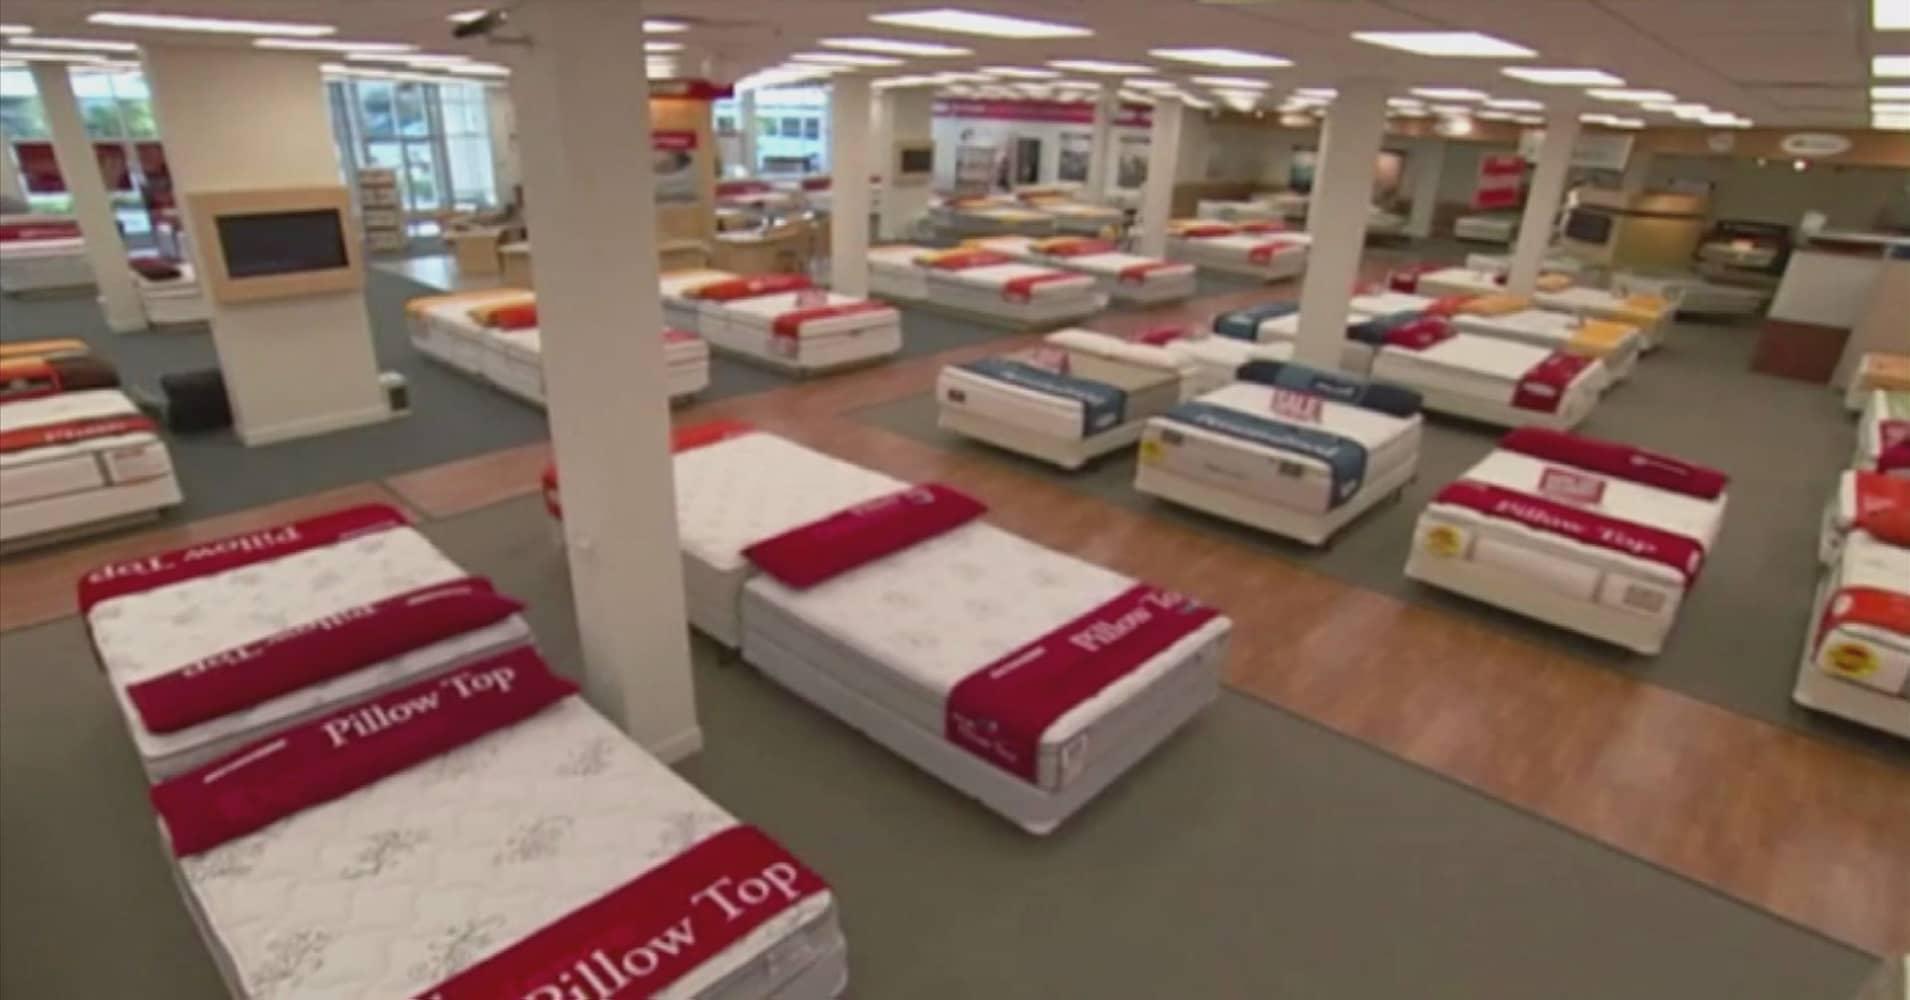 for winston of full outlet sleeper furniture victorian salem size ottoman firm xtenz rv new design mattress cicero sofa